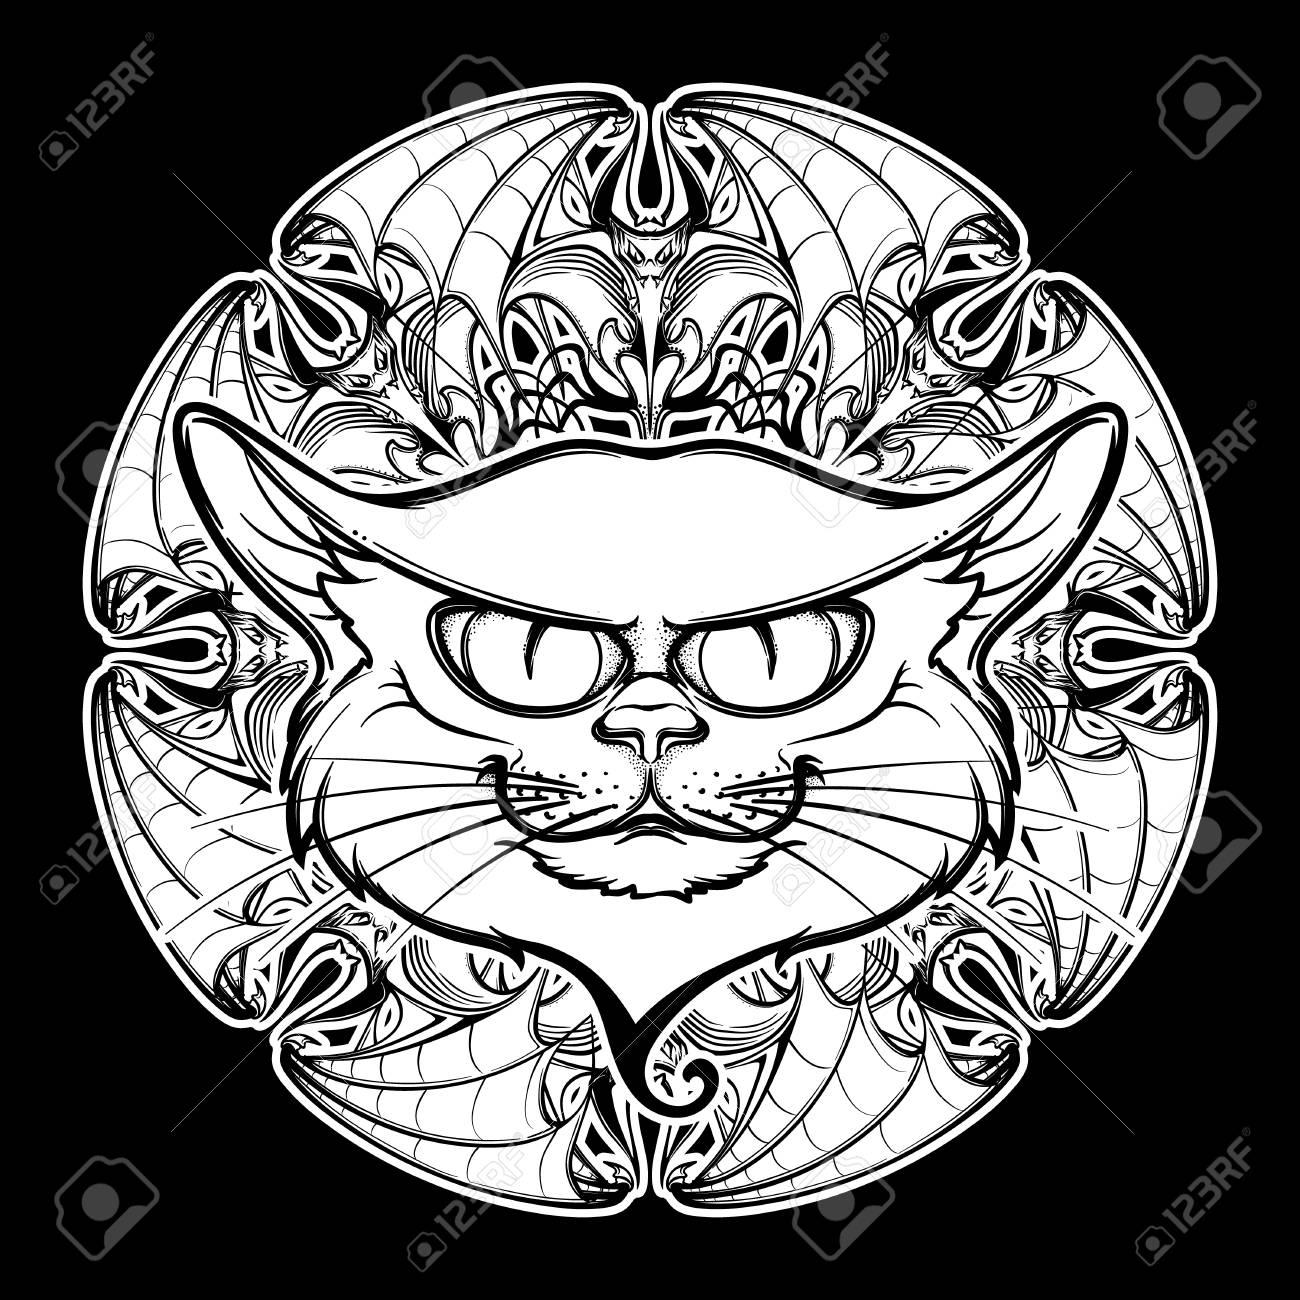 1300x1300 Halloween Illustration With Black Cat Head On Circular Ornament